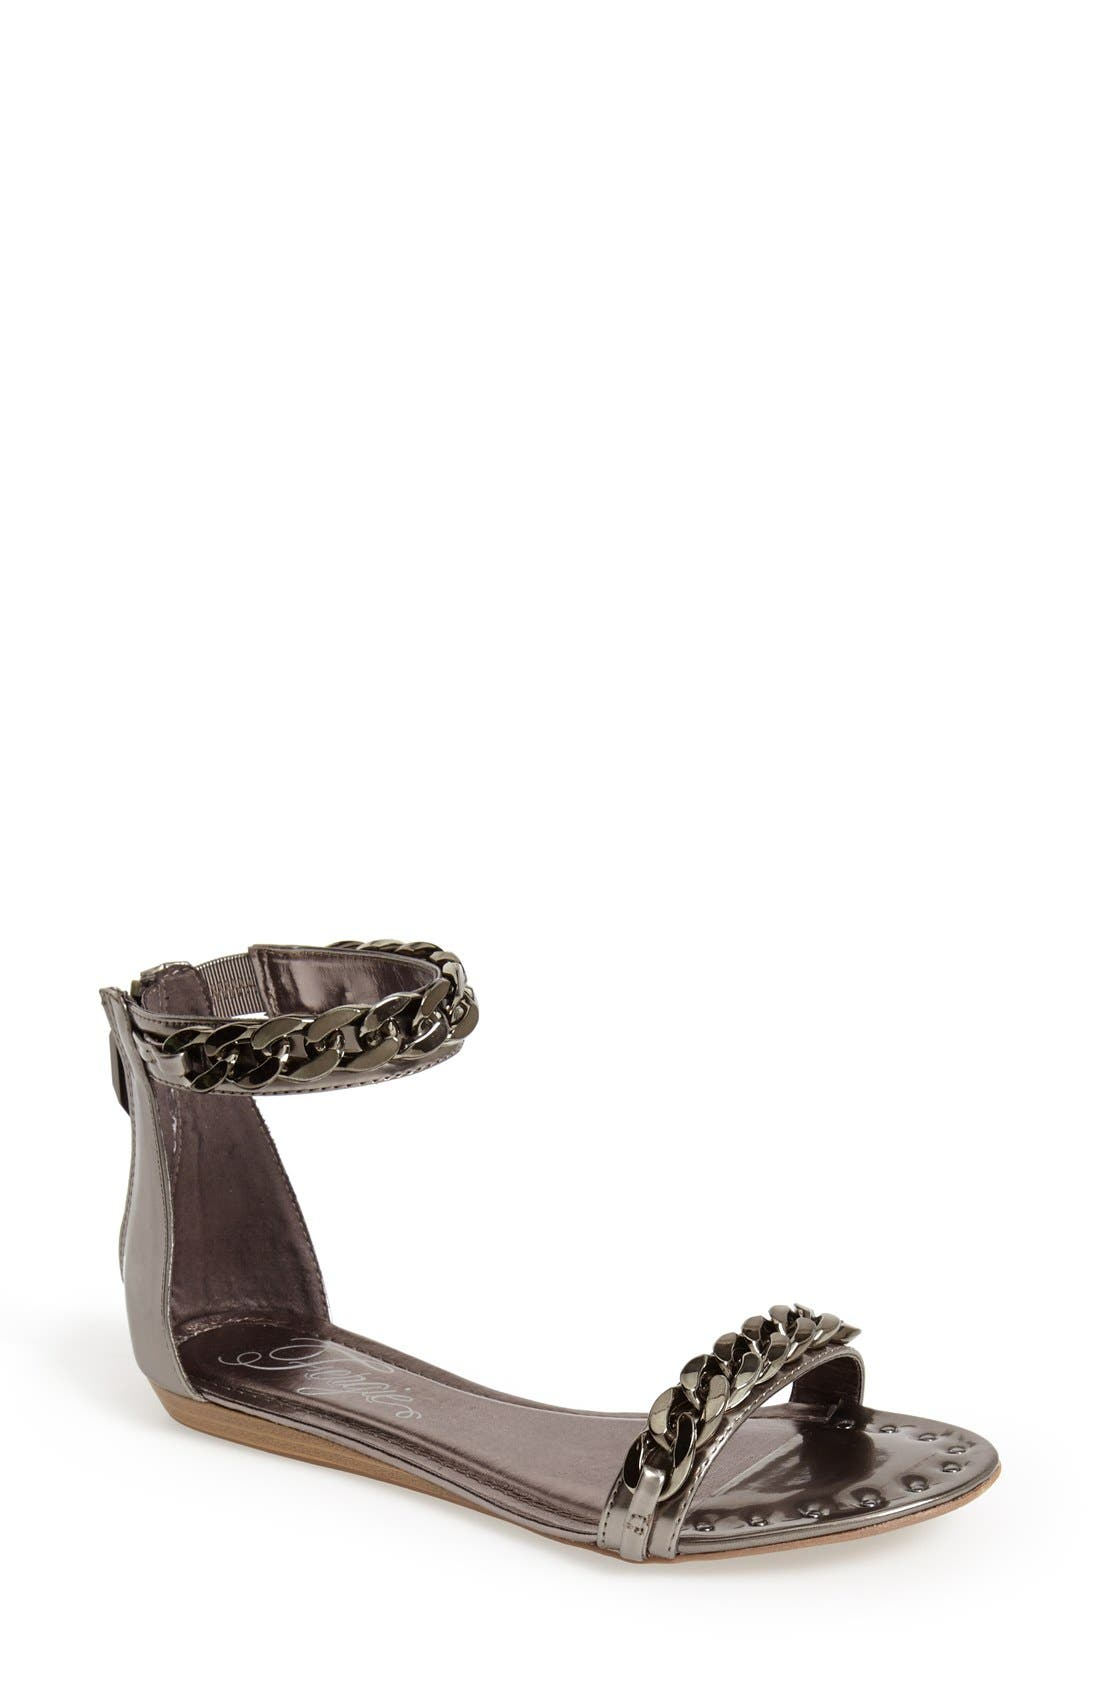 Main Image - Fergie 'Grind' Sandal (Women)